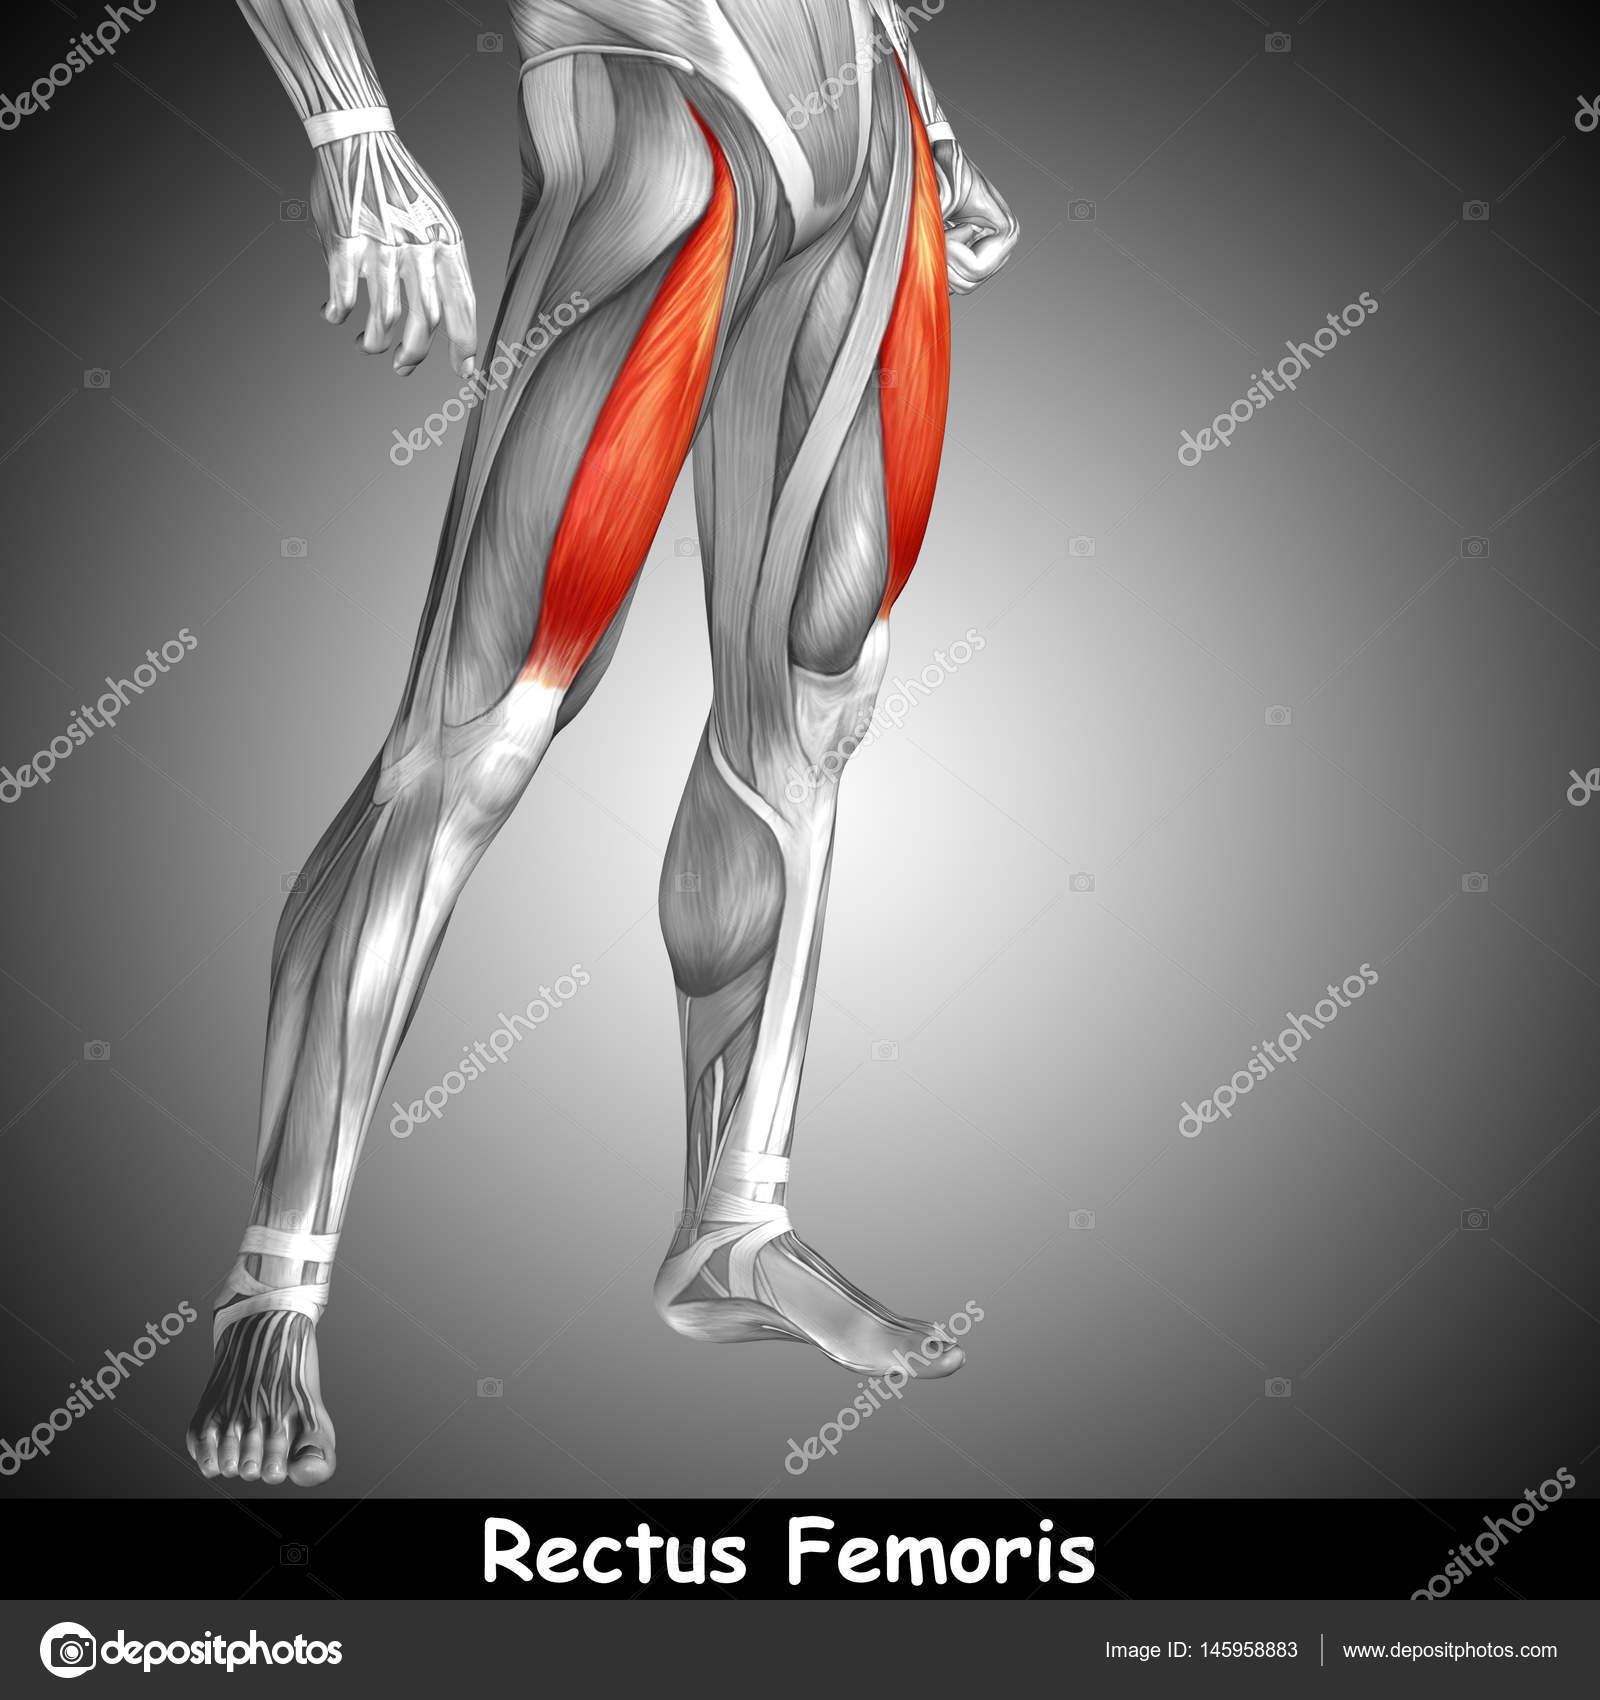 Concepto anatómico 3d ilustración — Foto de stock © design36 #145958883